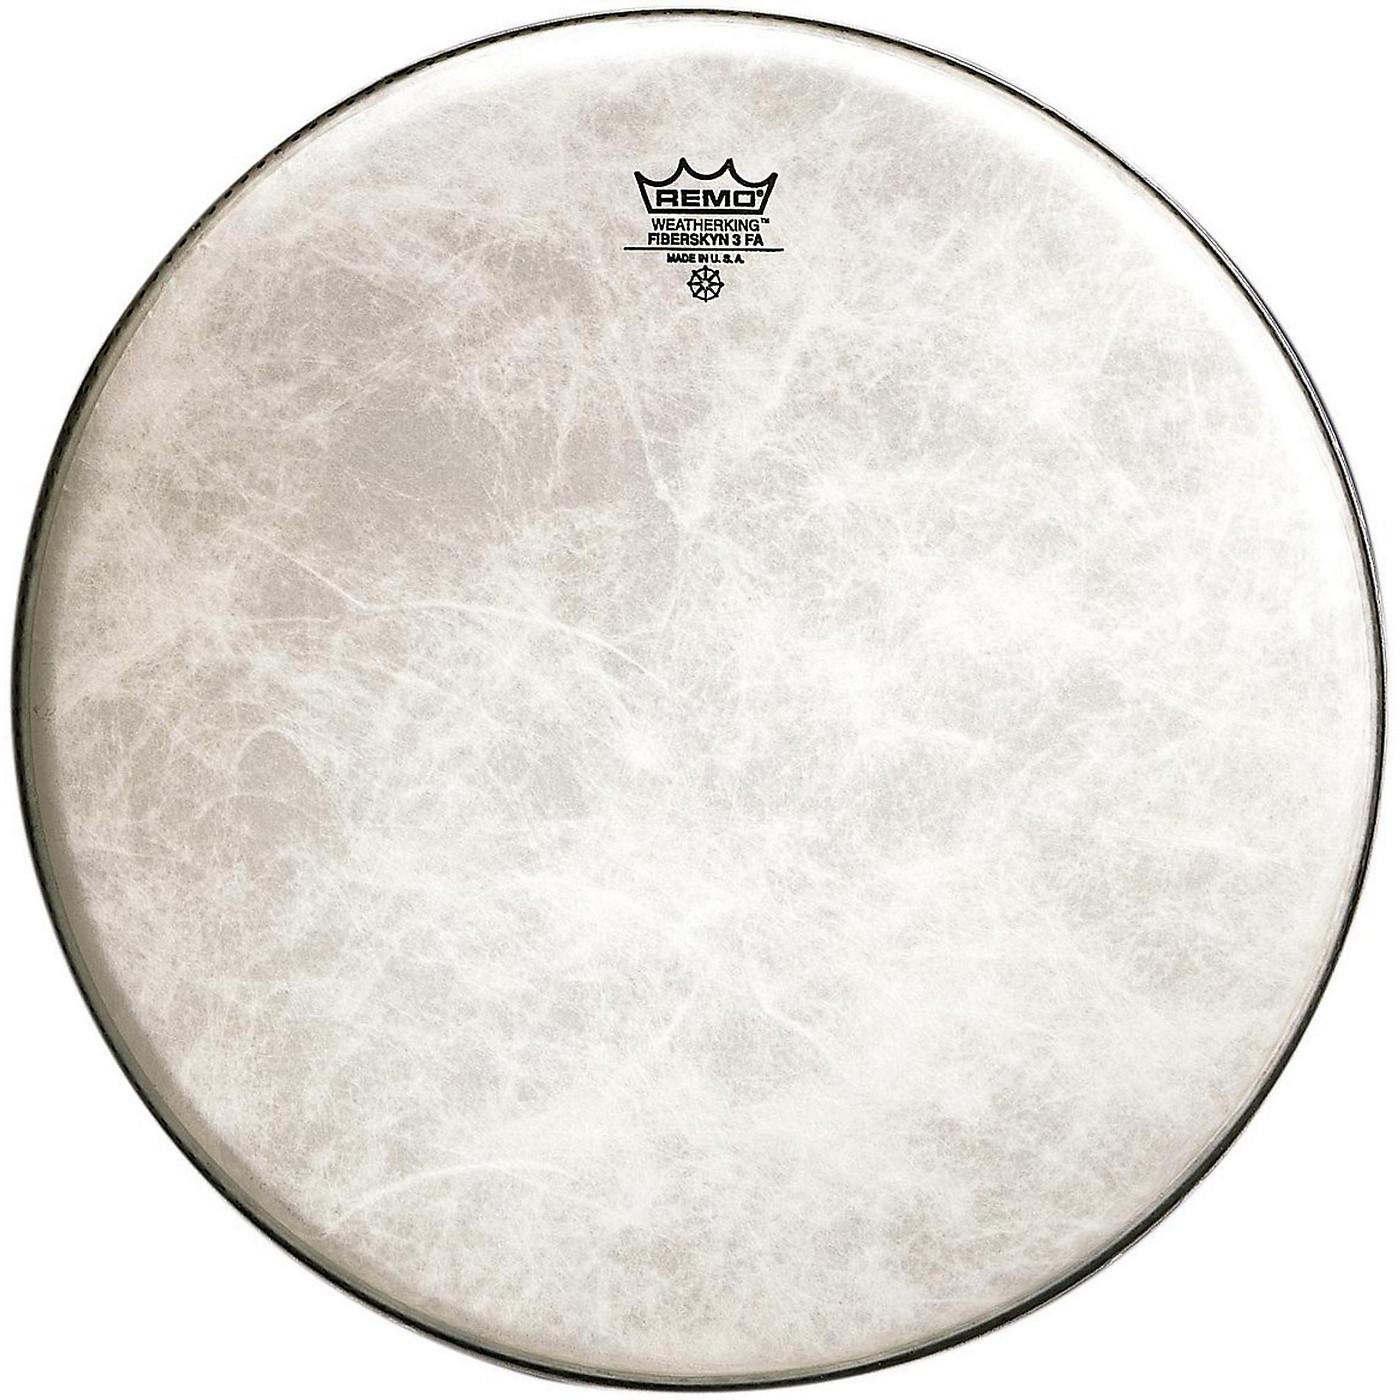 Remo Powerstroke 3 Fiberskyn Thin Bass Drum Heads thumbnail